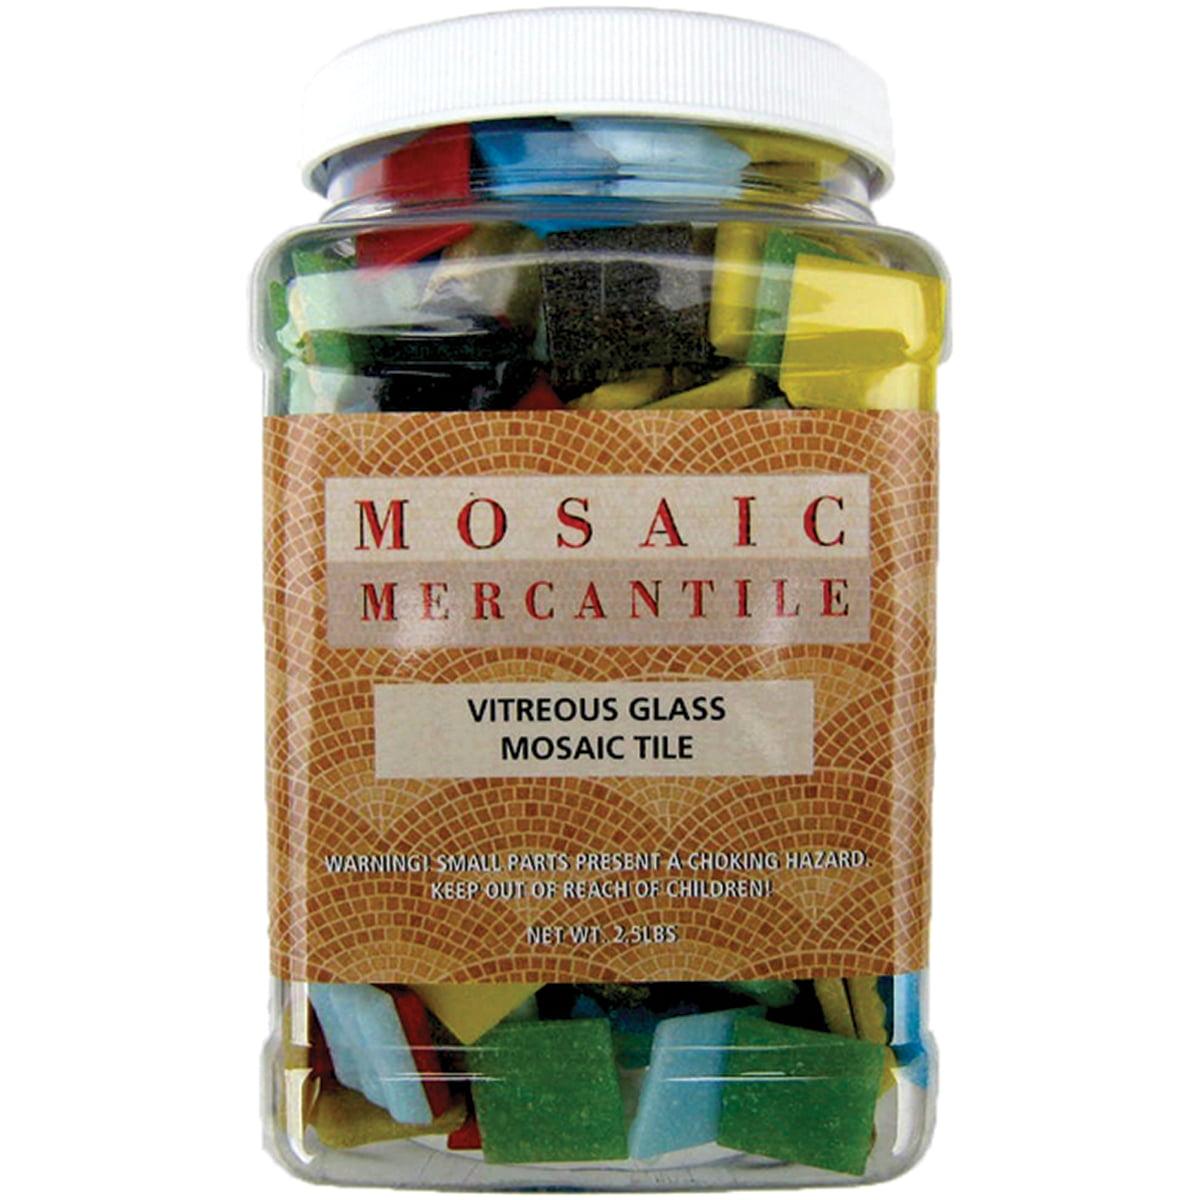 Mosaic Mercantile Crafter's Cut Mosaic Tiles